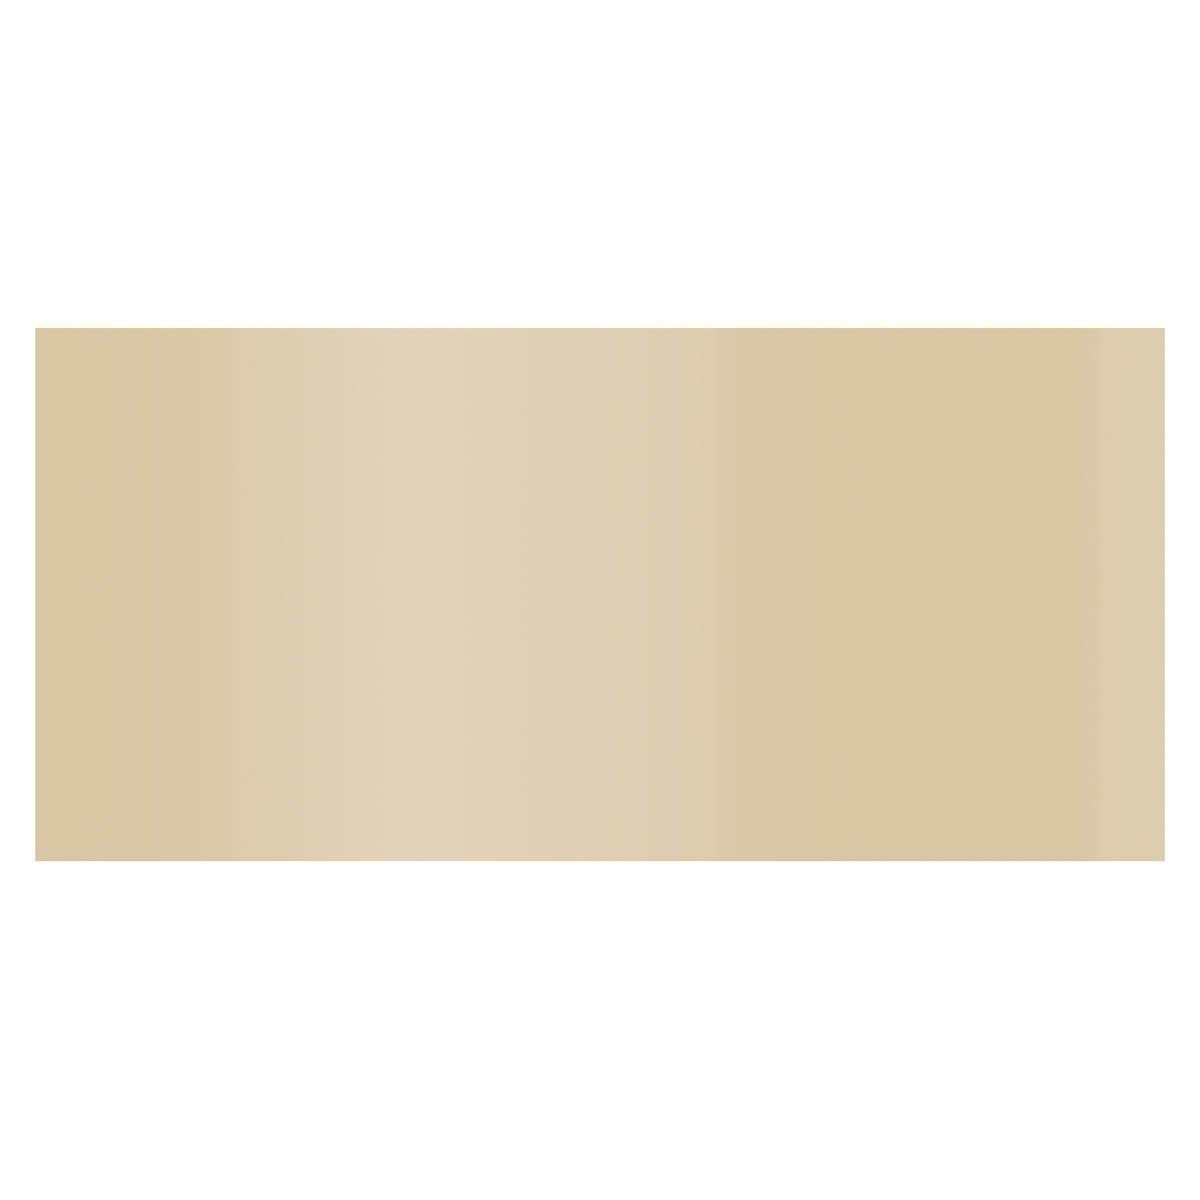 Waverly ® Inspirations Metallic Multi-Surface Acrylic Paint - Moonstone, 2 oz.